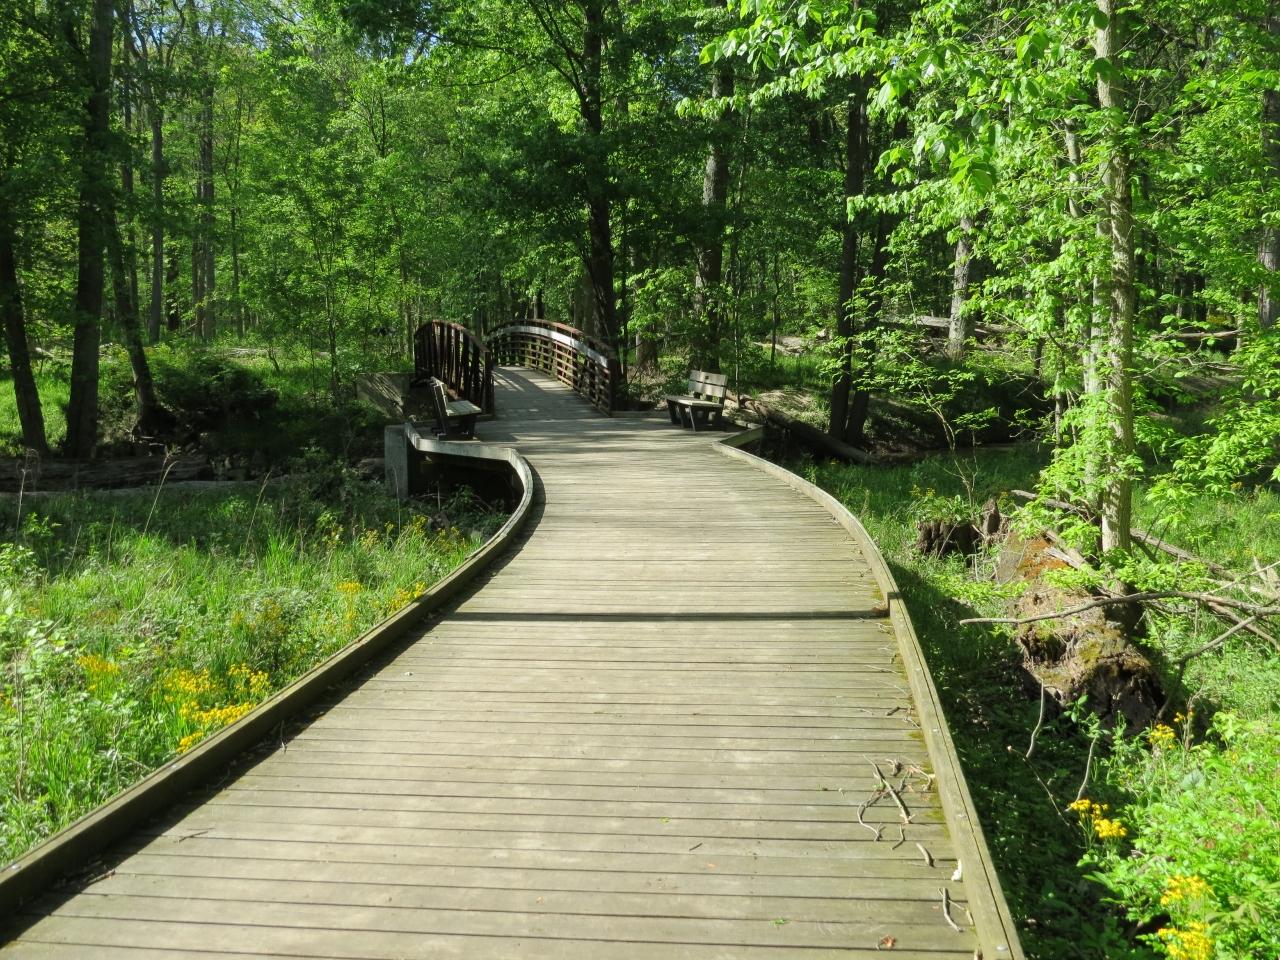 Boardwalk and bridge at Oak Openings (1280x960)